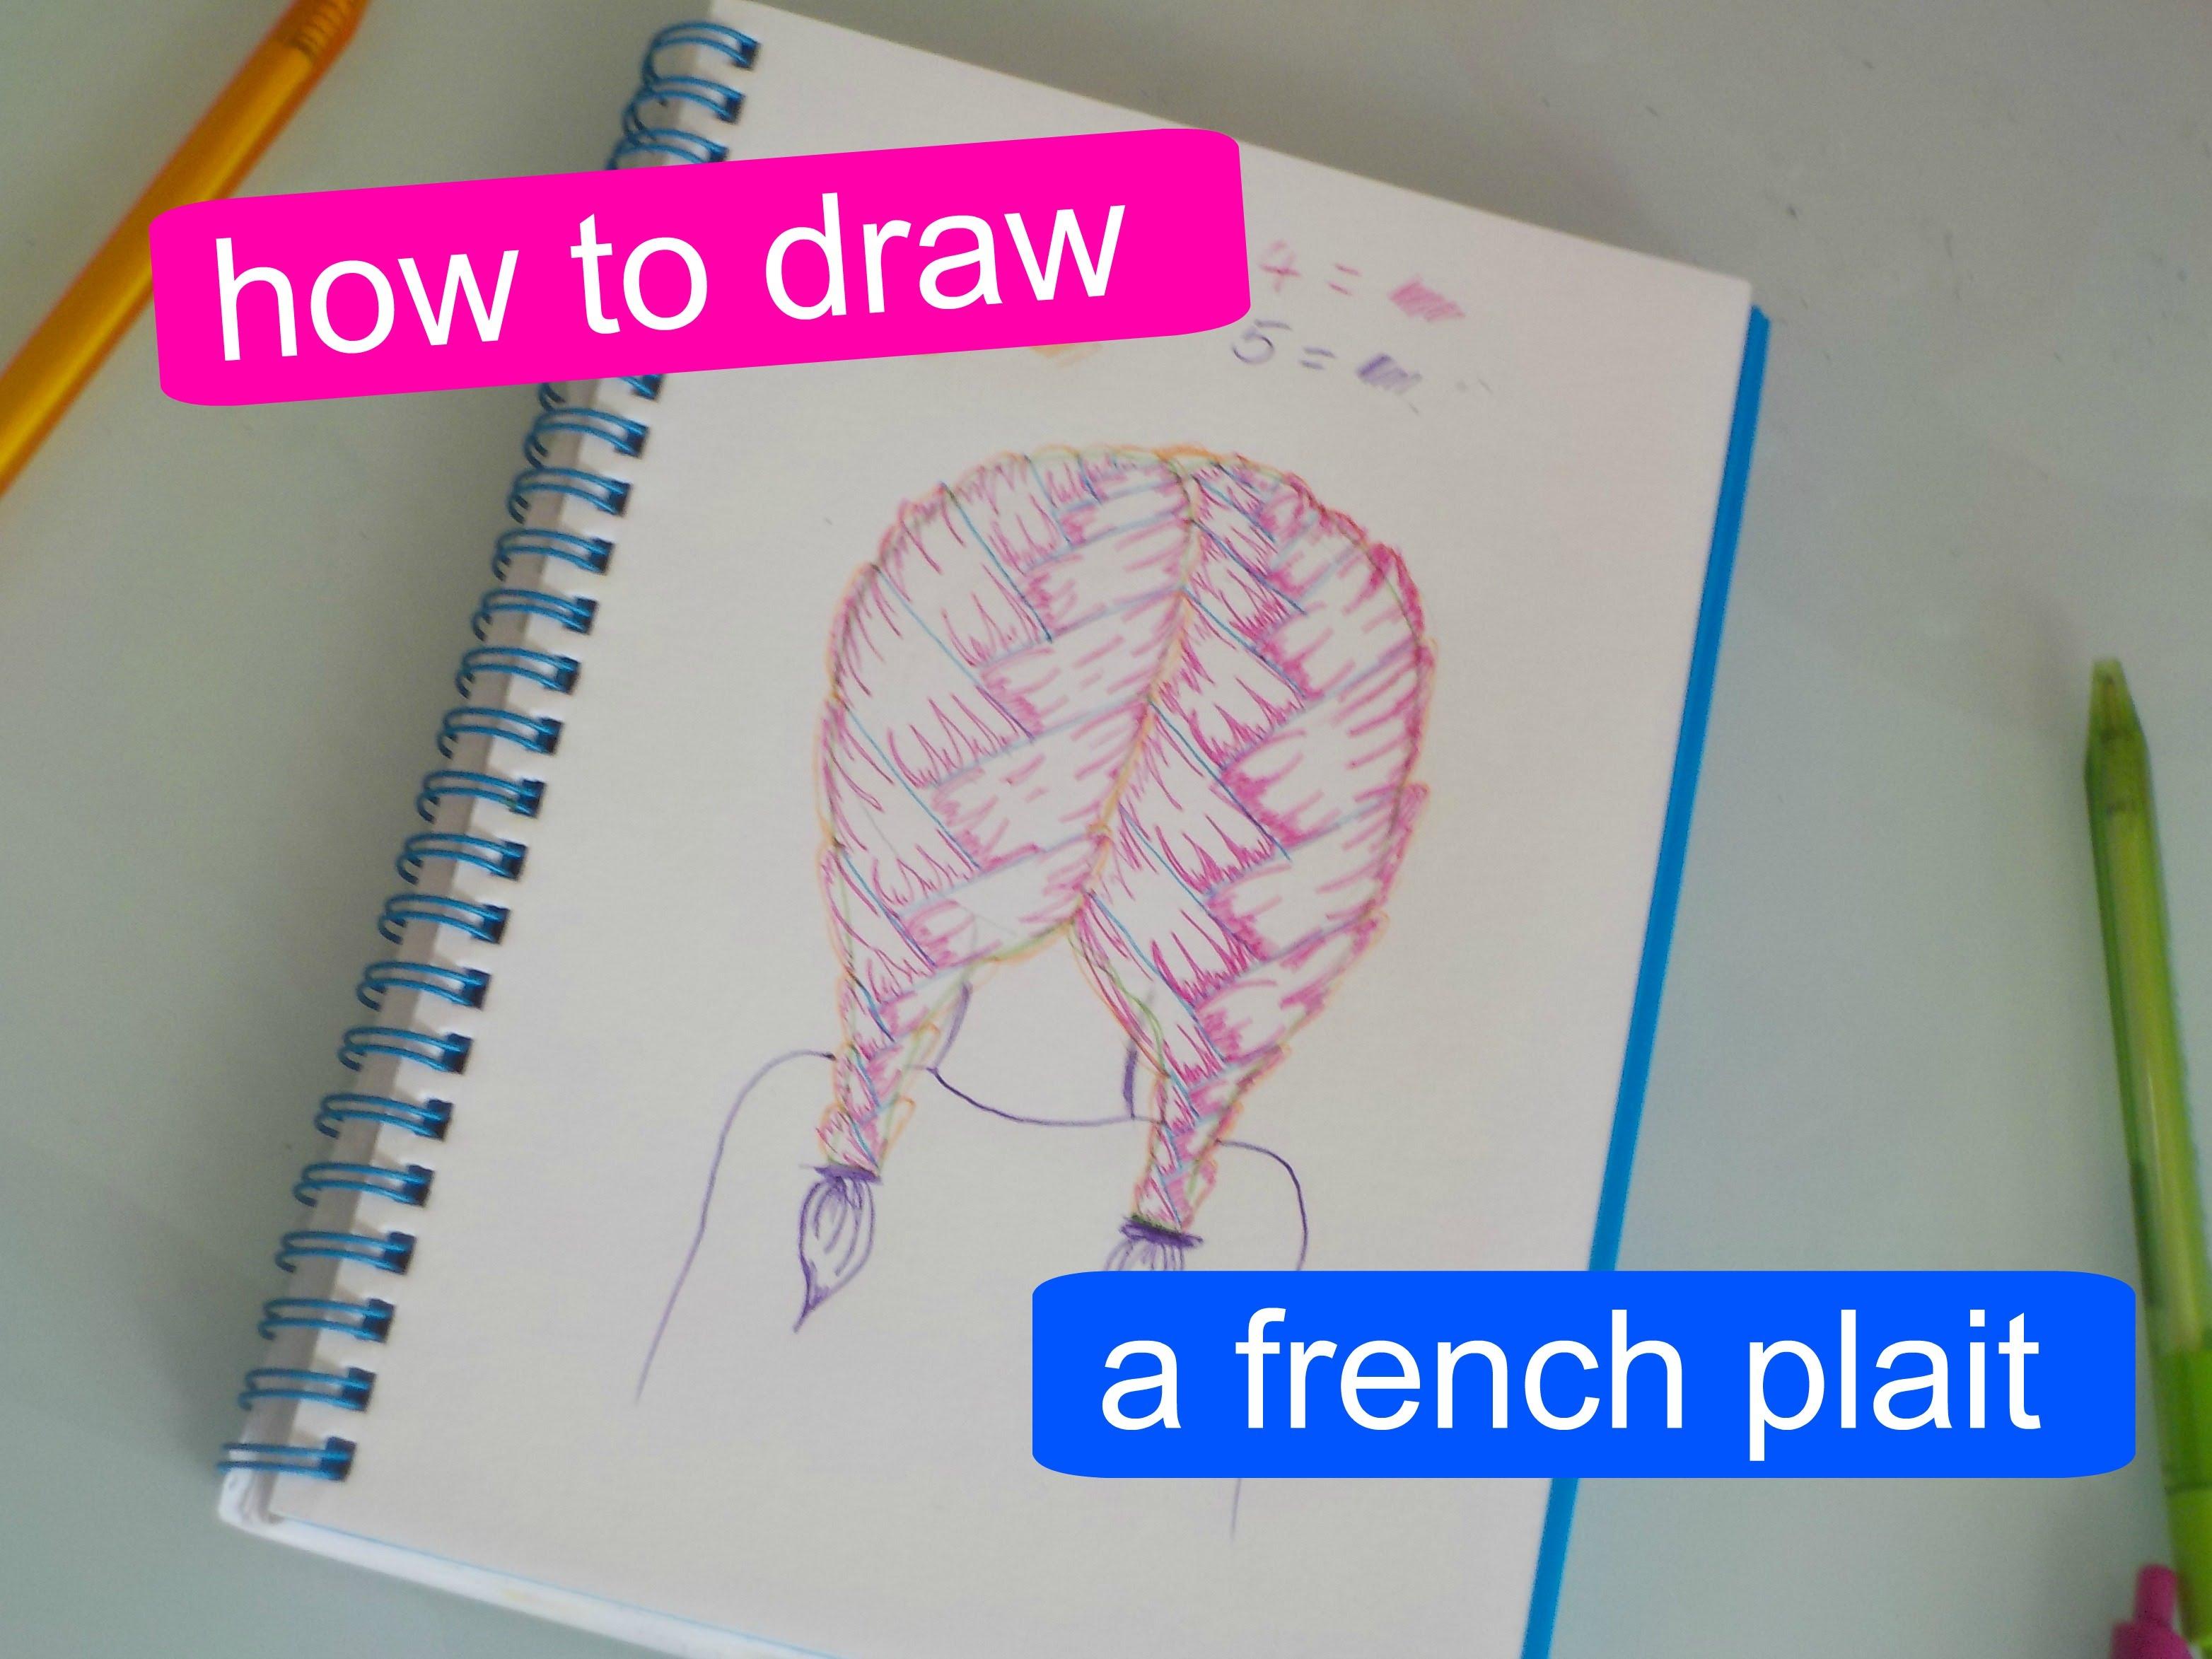 Drawn braid french braid Draw to plait french plait